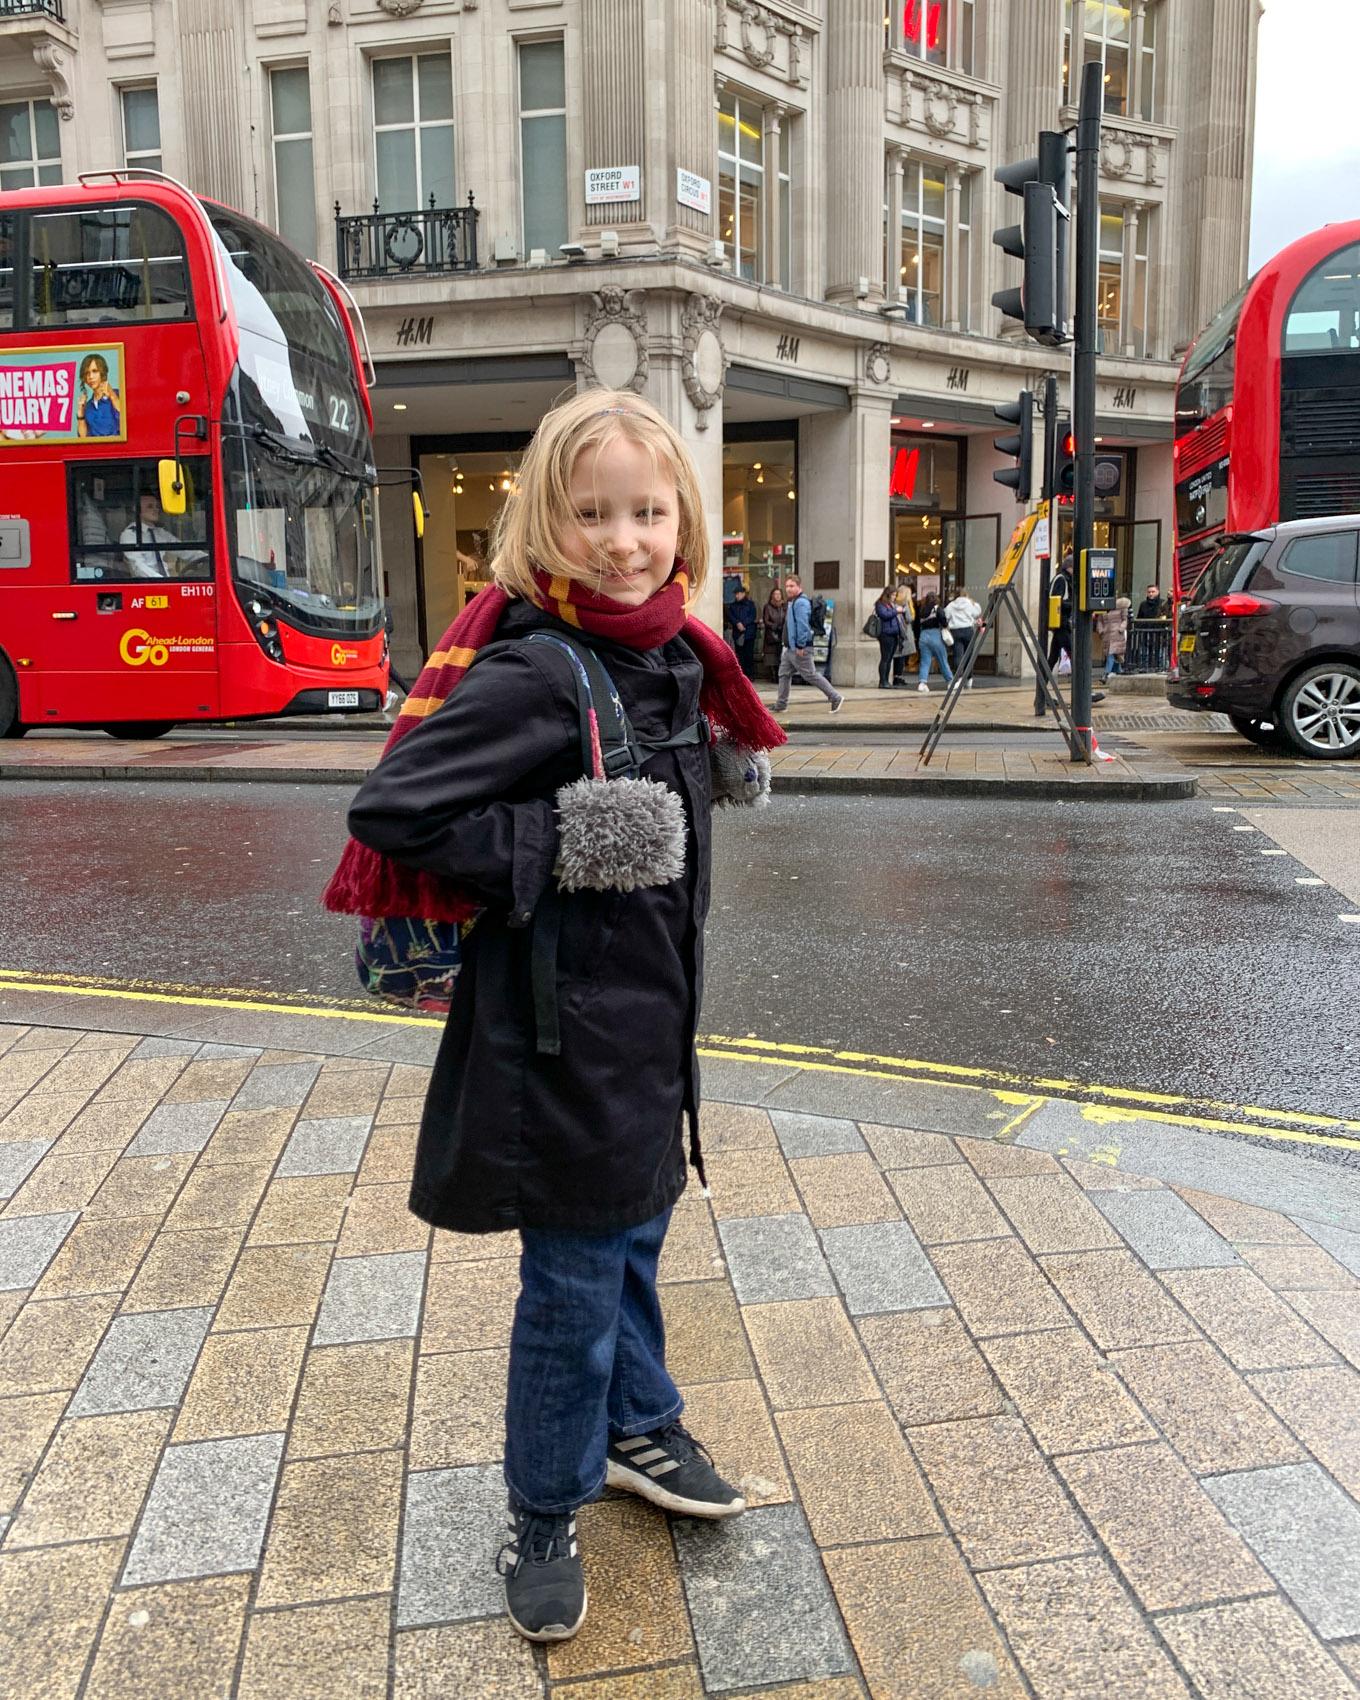 Lontoo - London - Oxford Circus